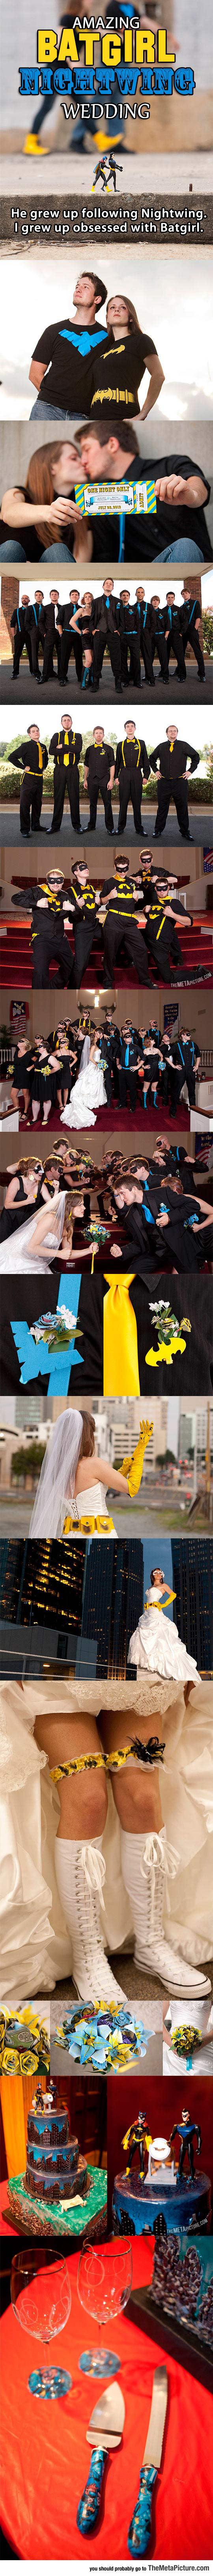 funny-Nightwing-Batgirl-shirt-couple